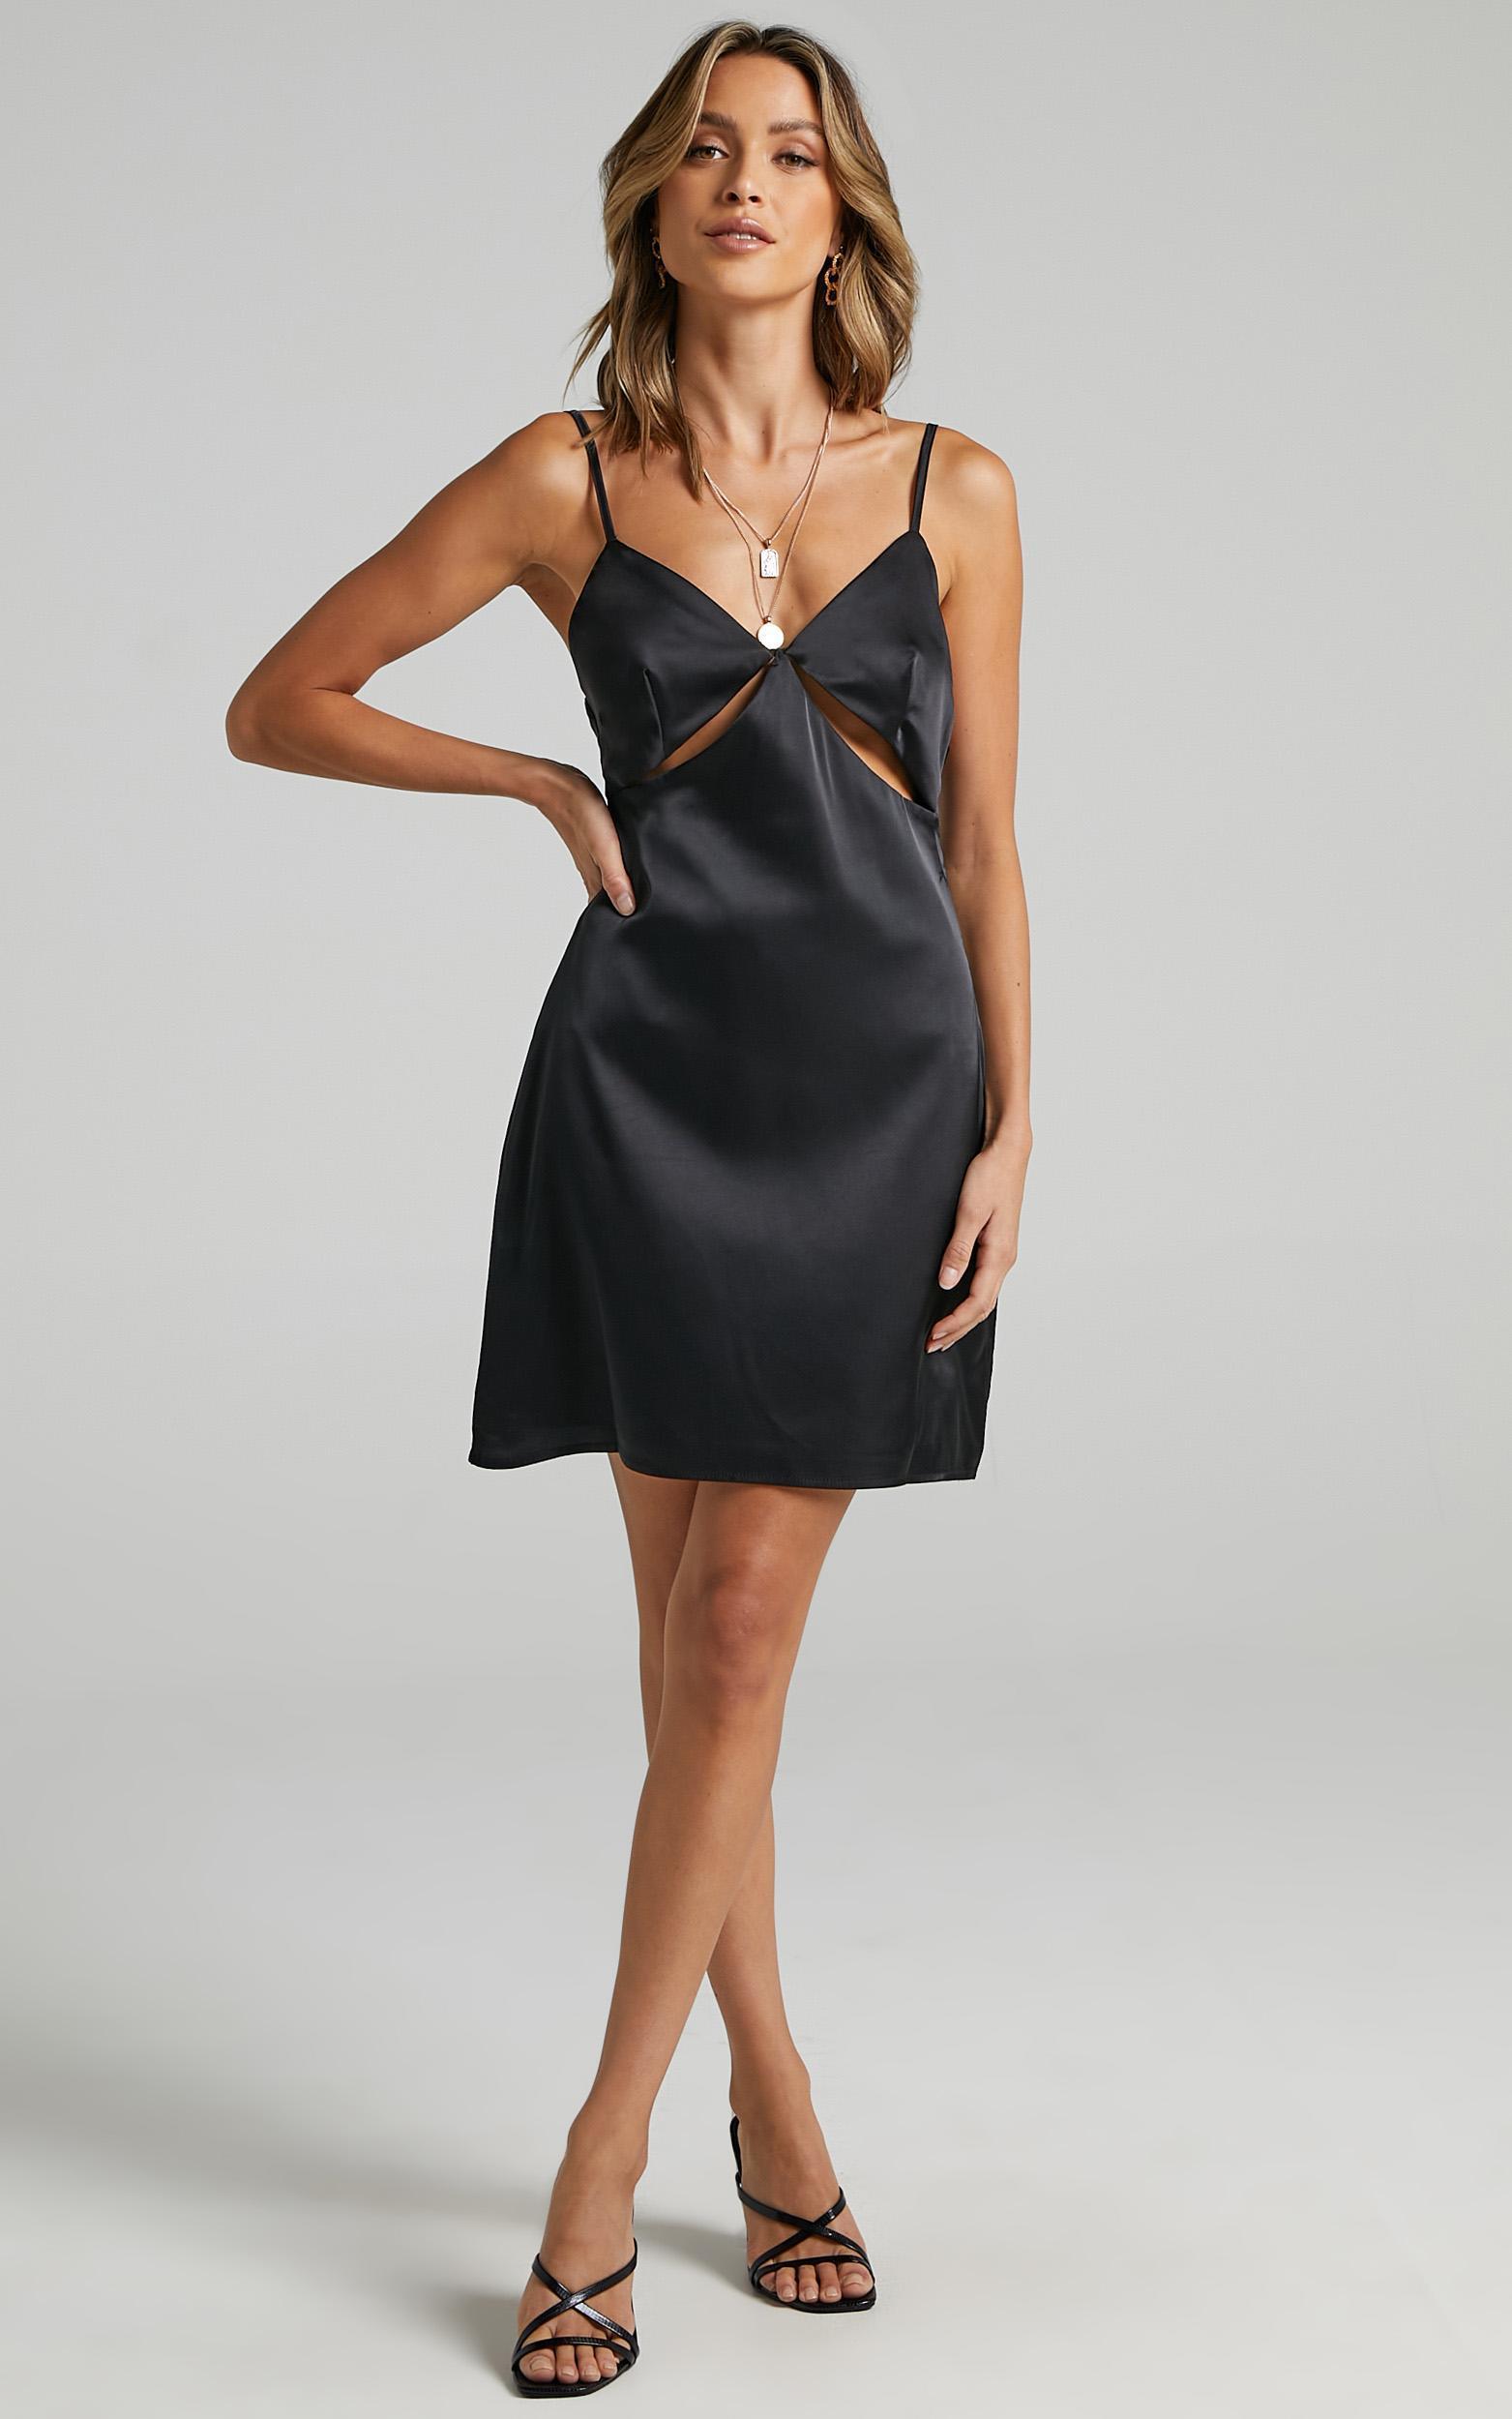 Puglia Dress in Black Satin - 6 (XS), Black, hi-res image number null